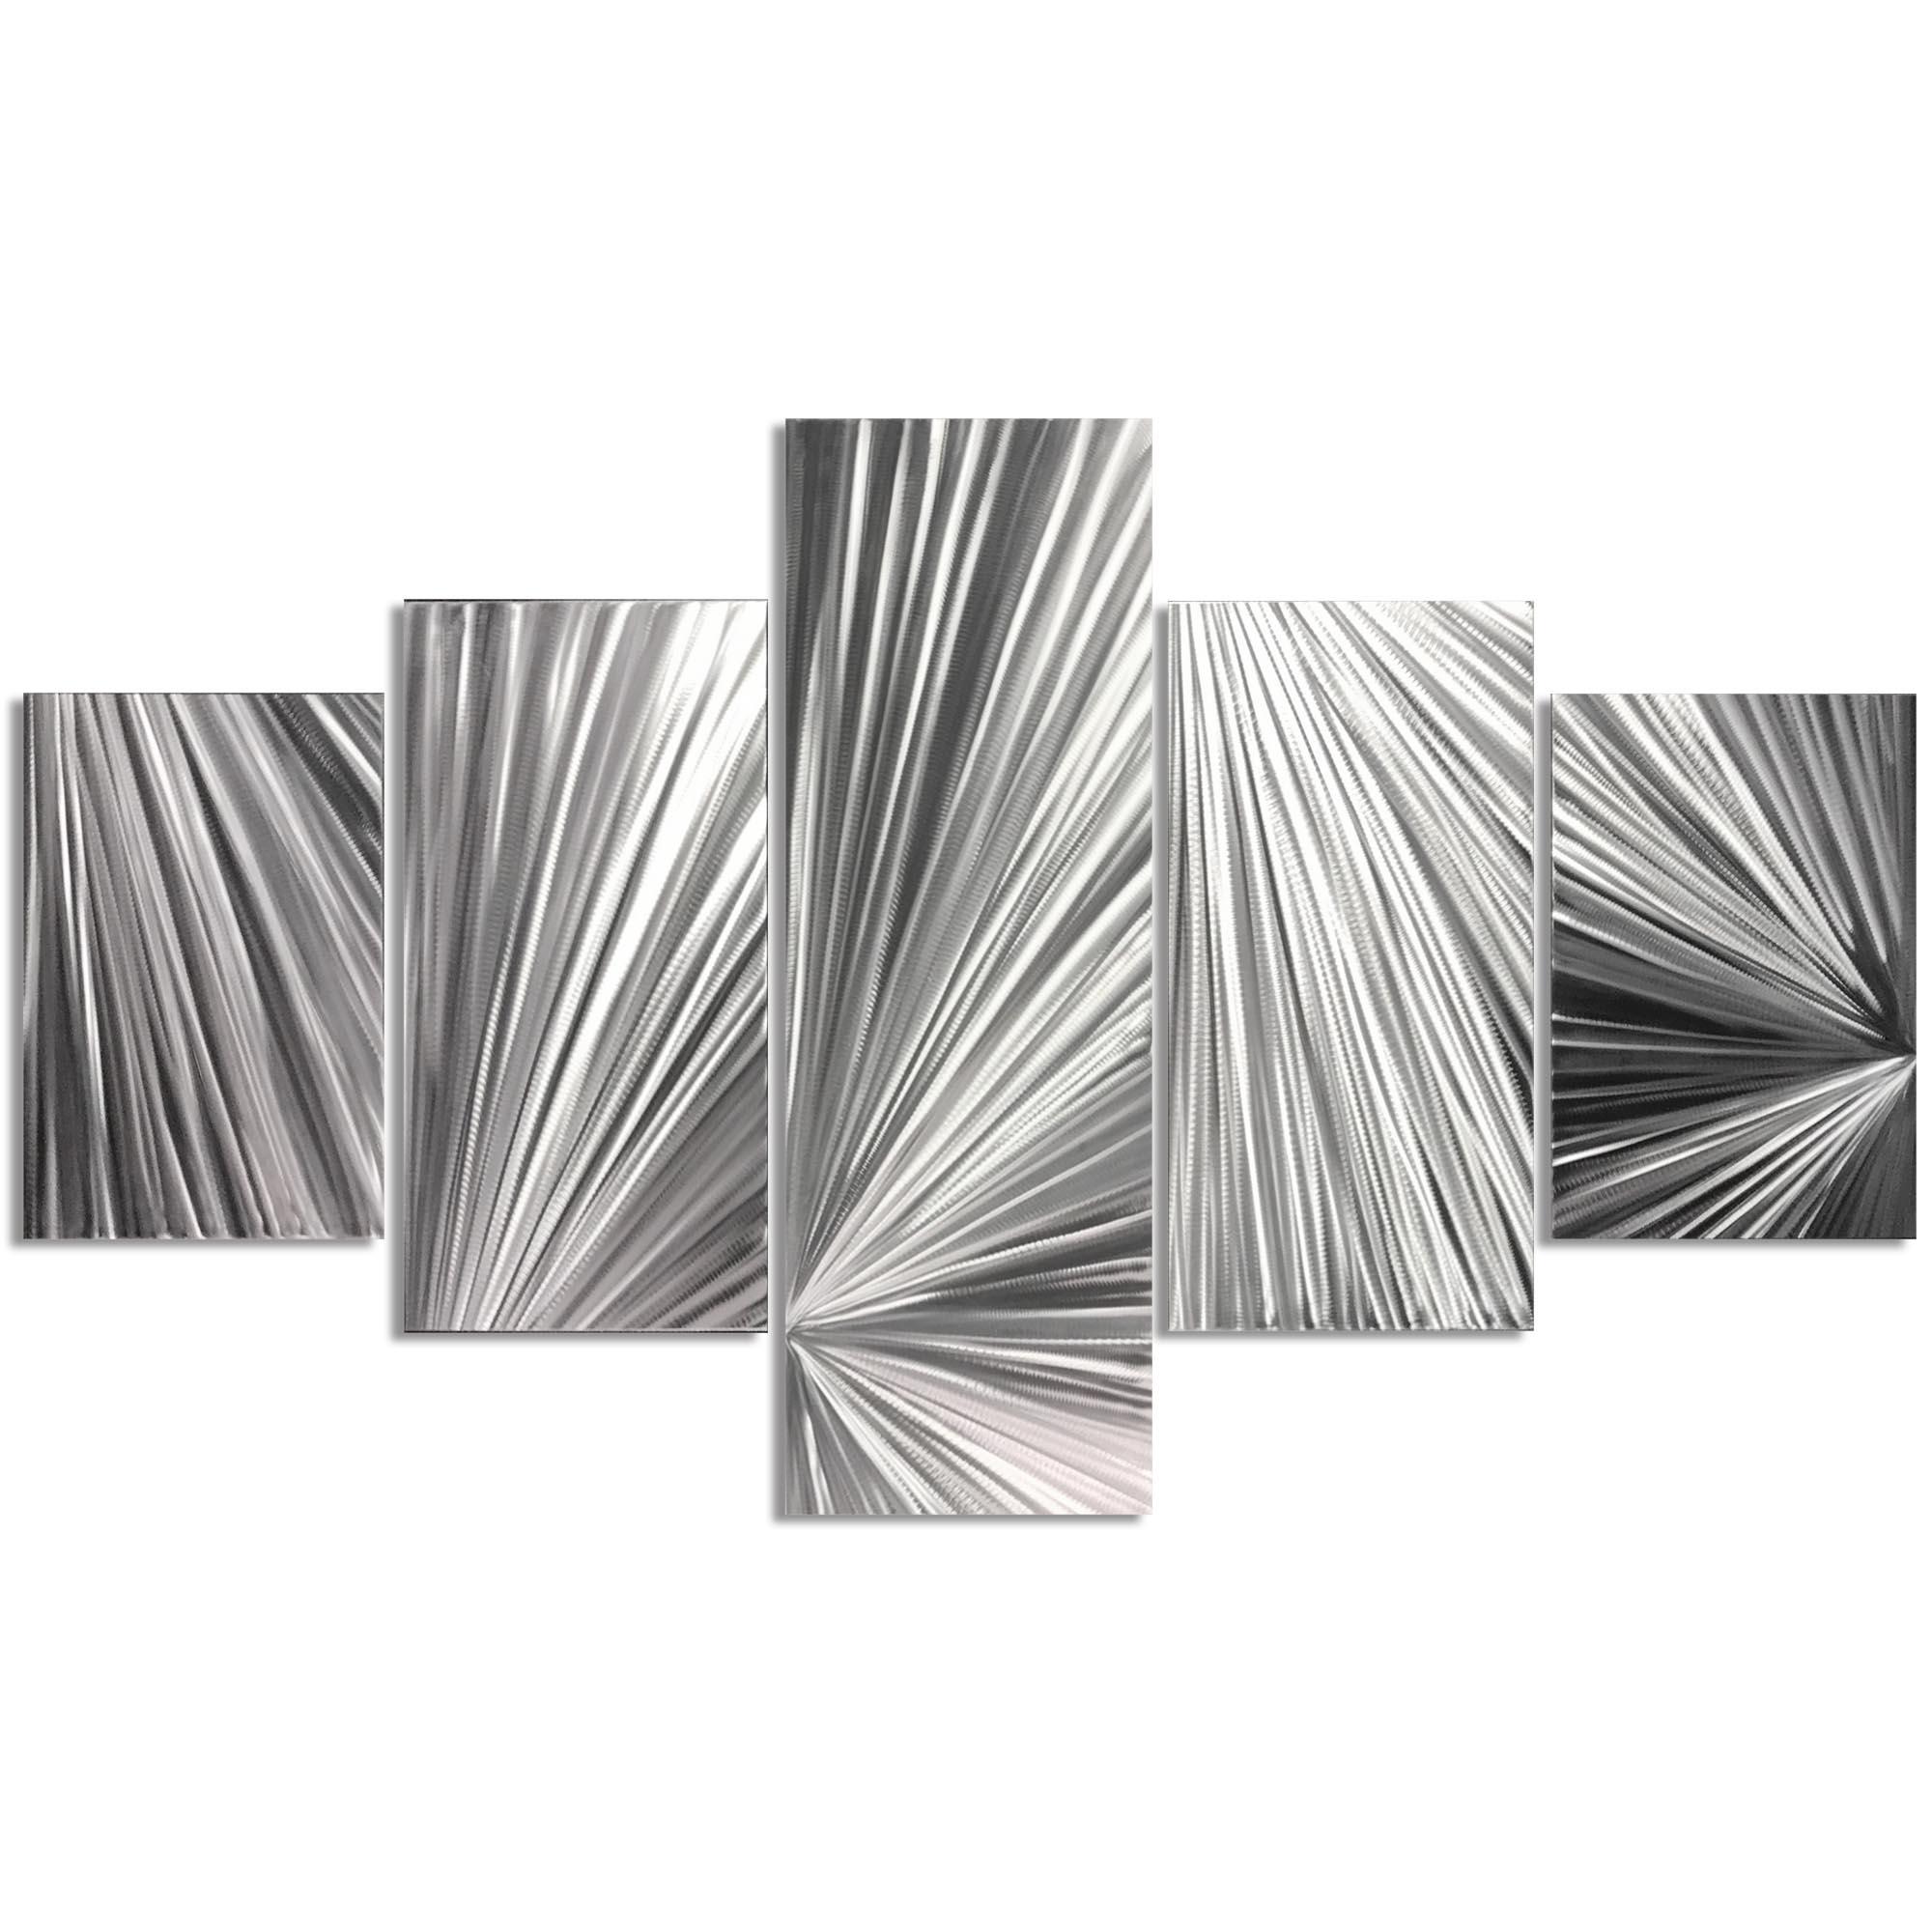 Columnar Light 64x36in. Natural Aluminum Abstract Decor